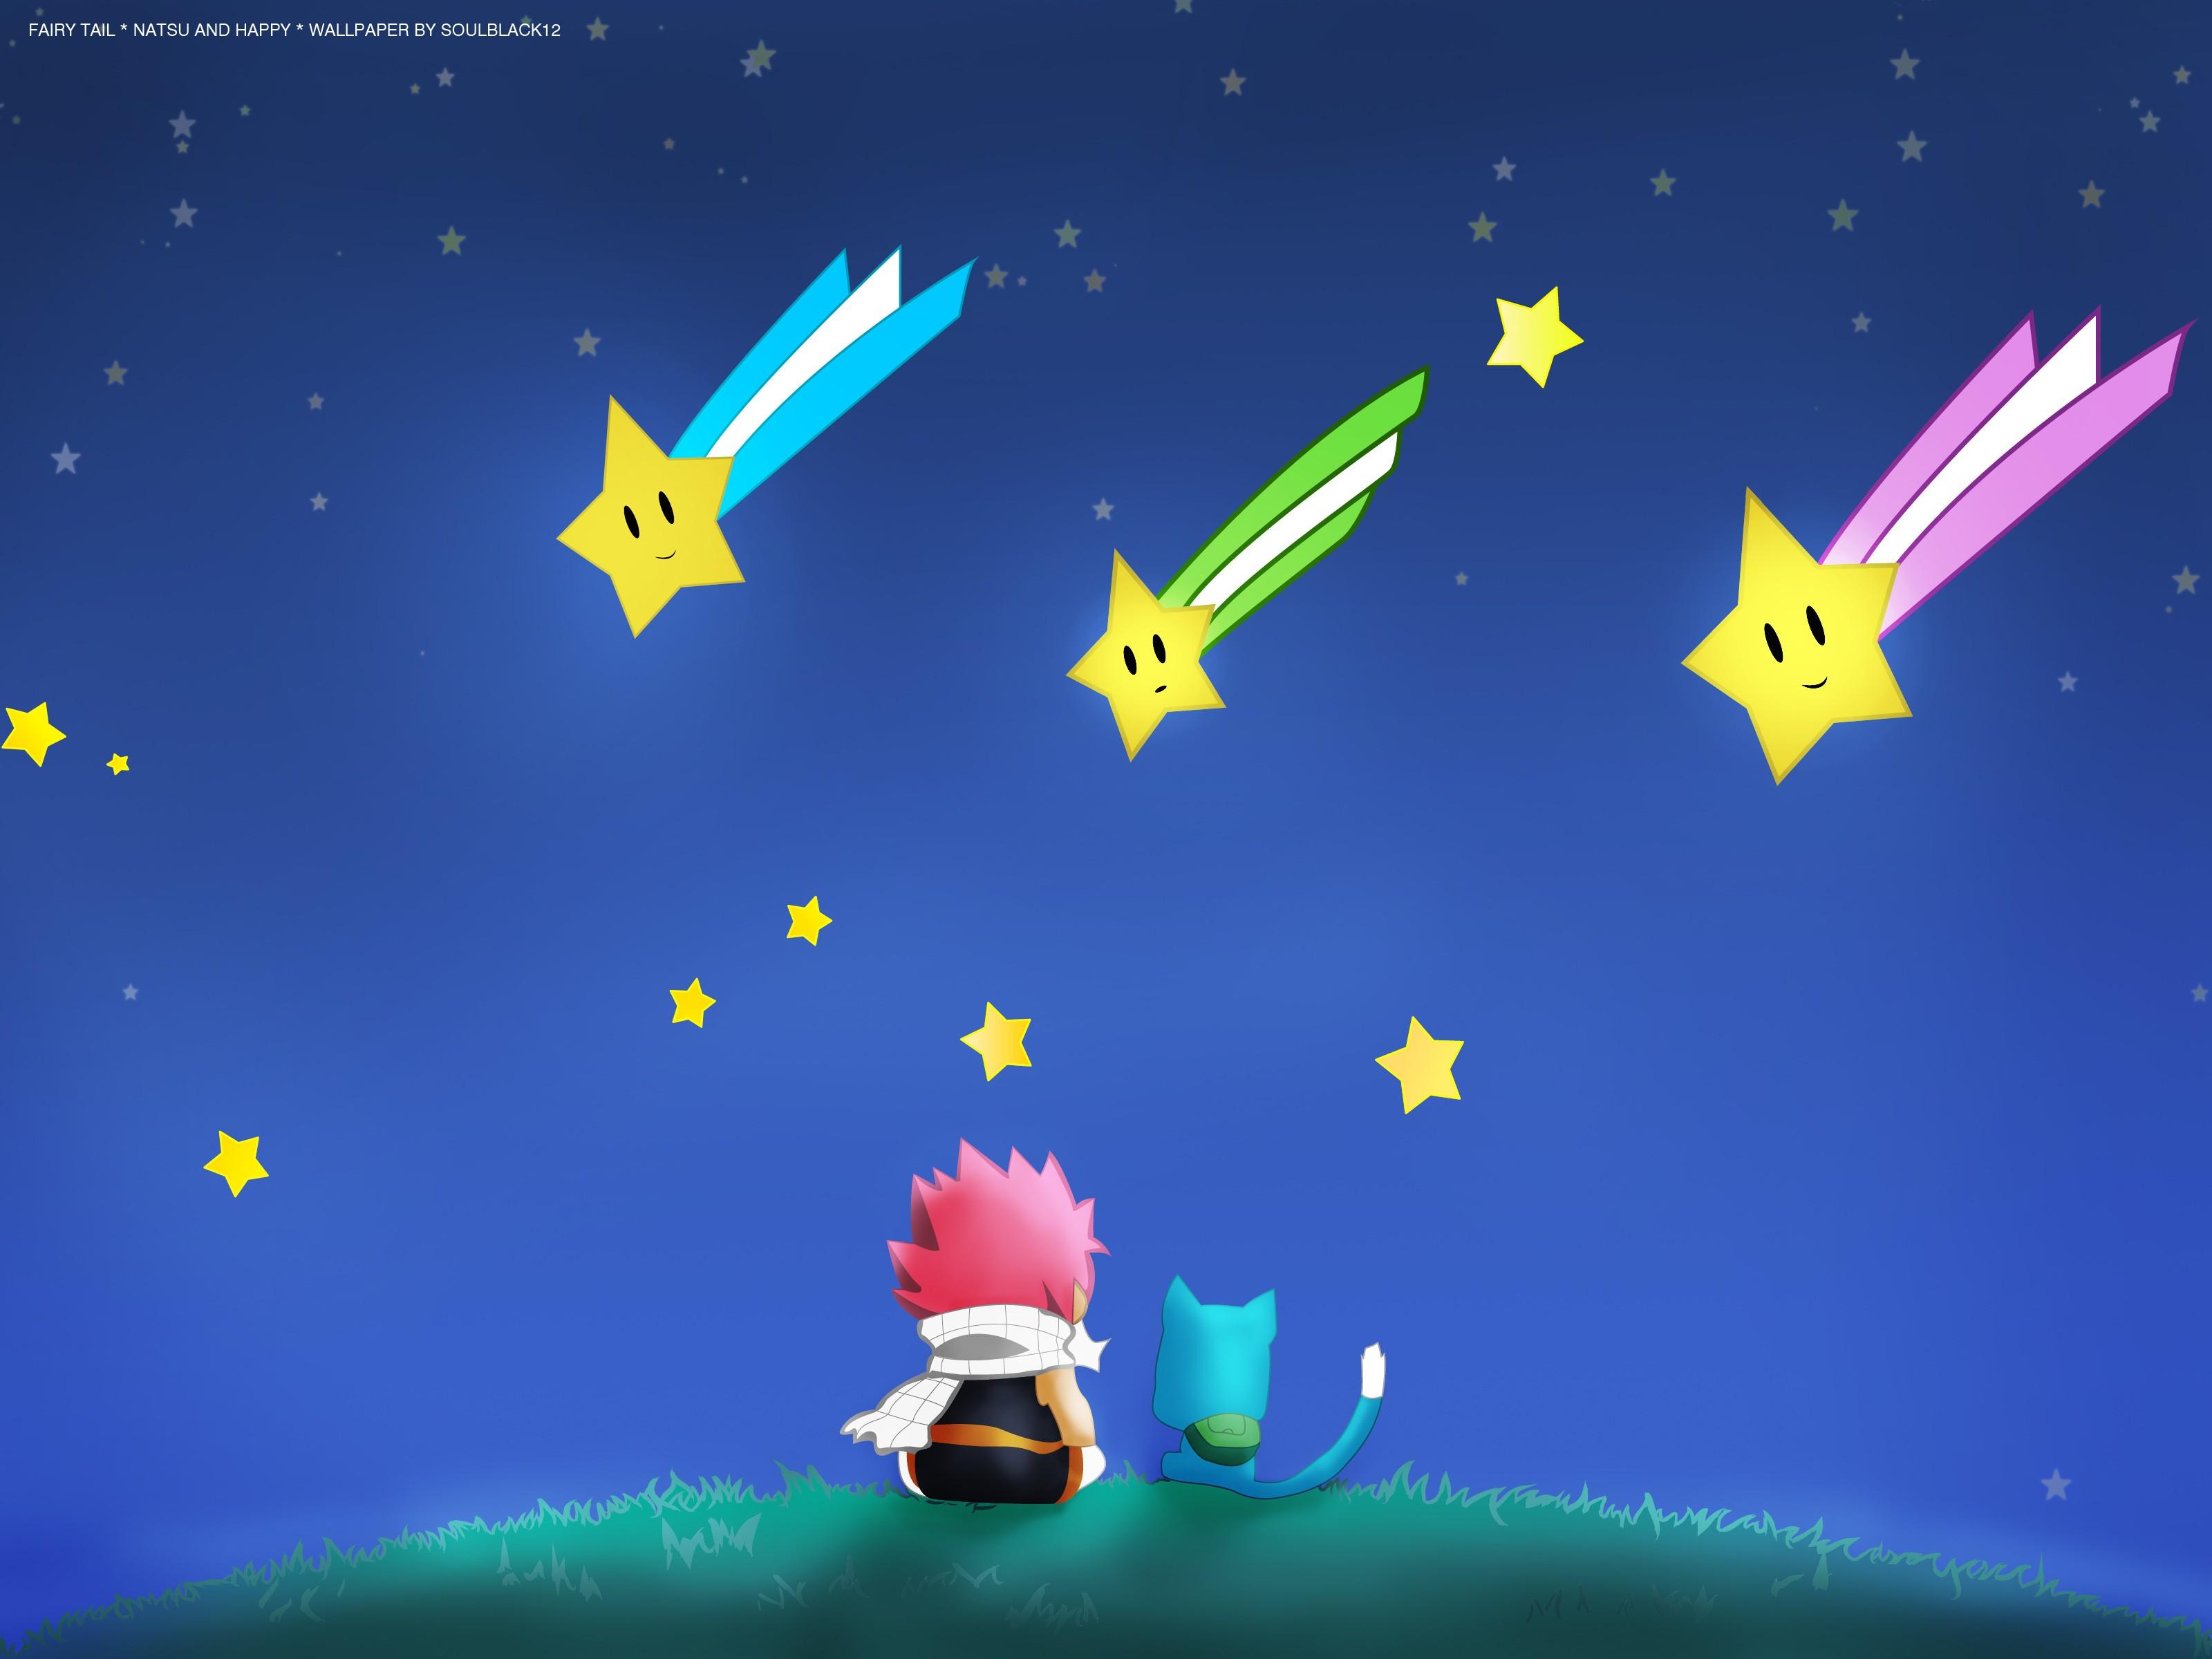 Stars happy fairy tail dragneel natsu anime anime boys 3200x2400